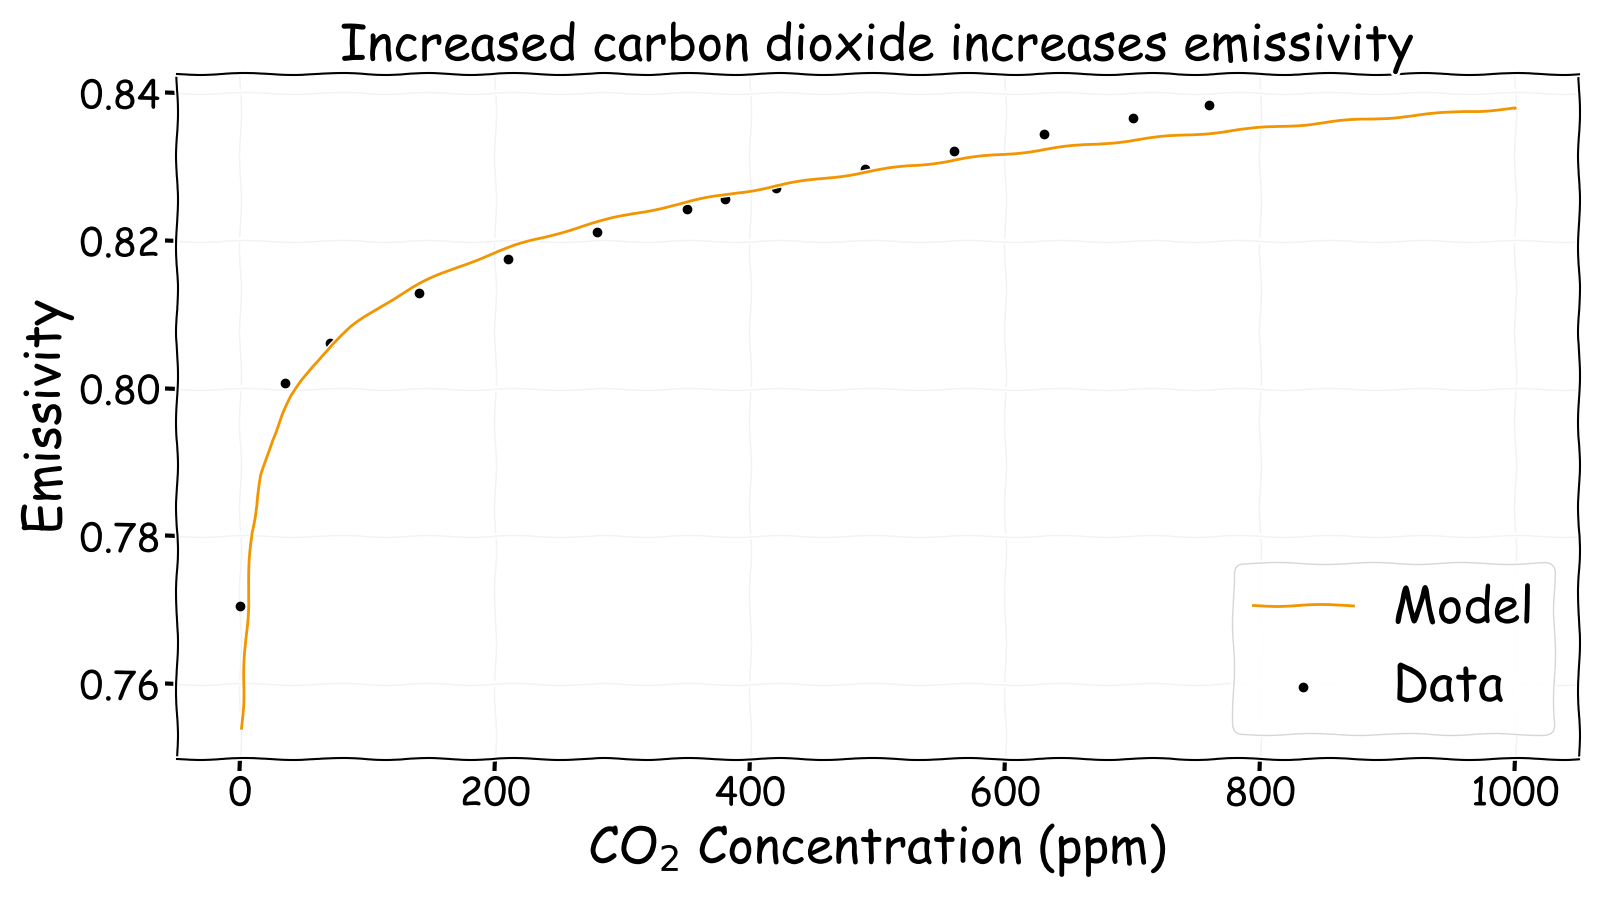 Increased carbon dioxide increases atmospheric emissivity